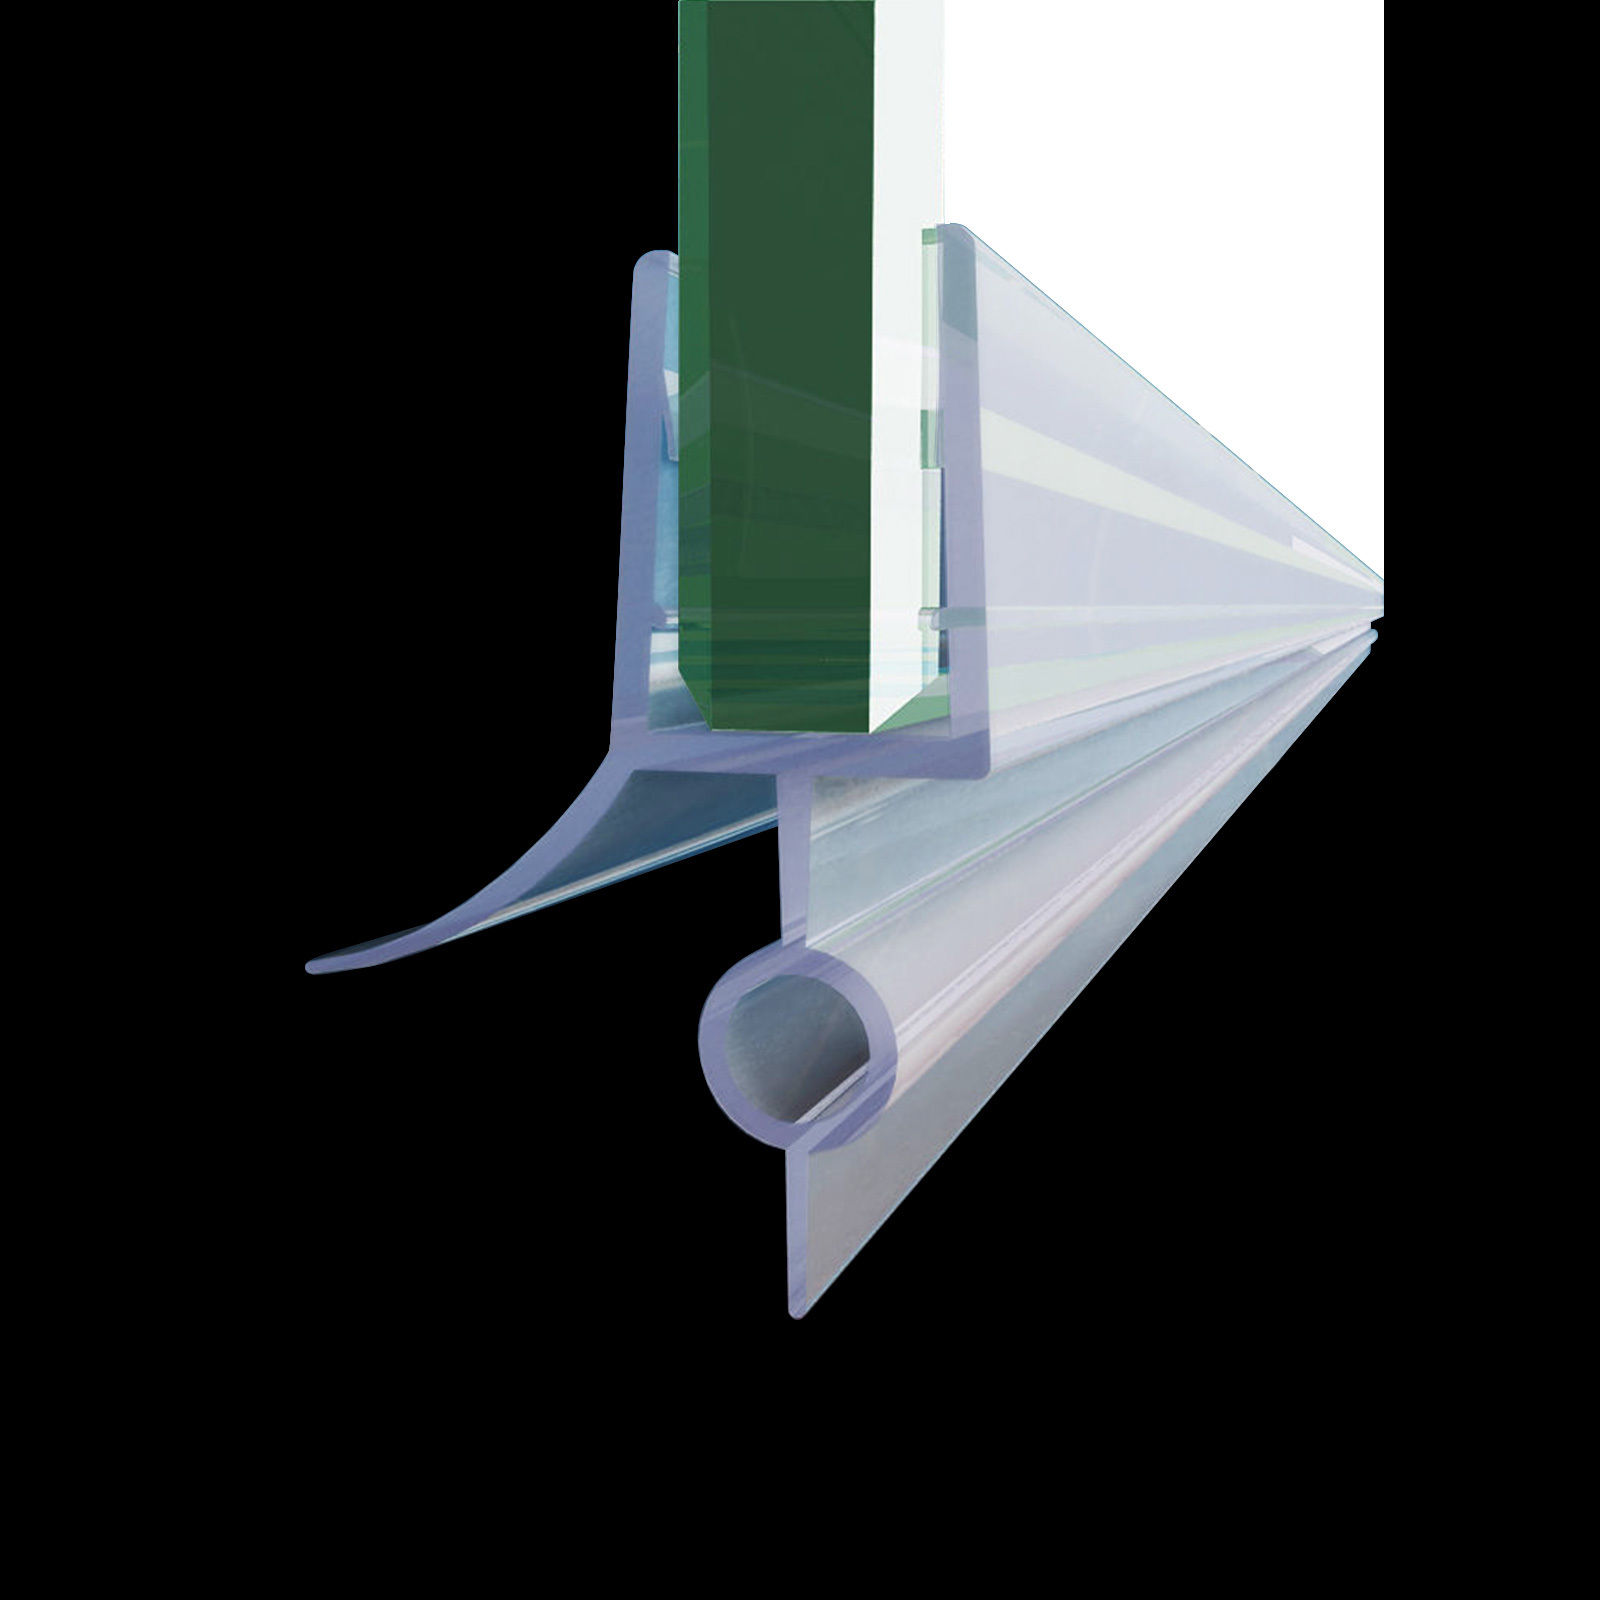 Details About Sunny Shower Door Seal Strip For 3 8 Inch Glass Shower Door Bottom Seal 36 In L